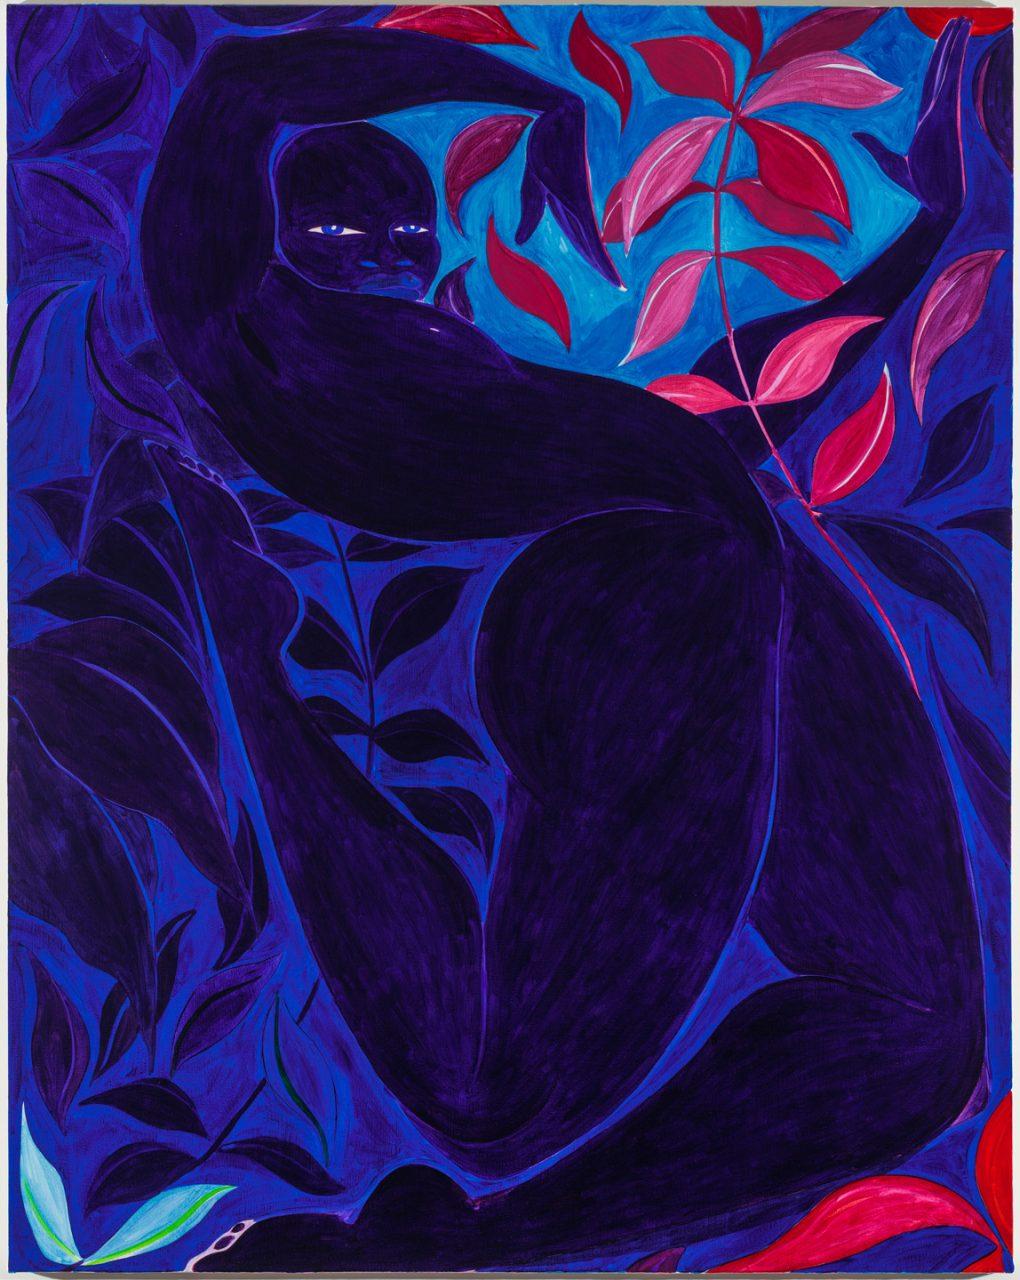 Flash of the Spirit | Tunji Adeniyi-Jones